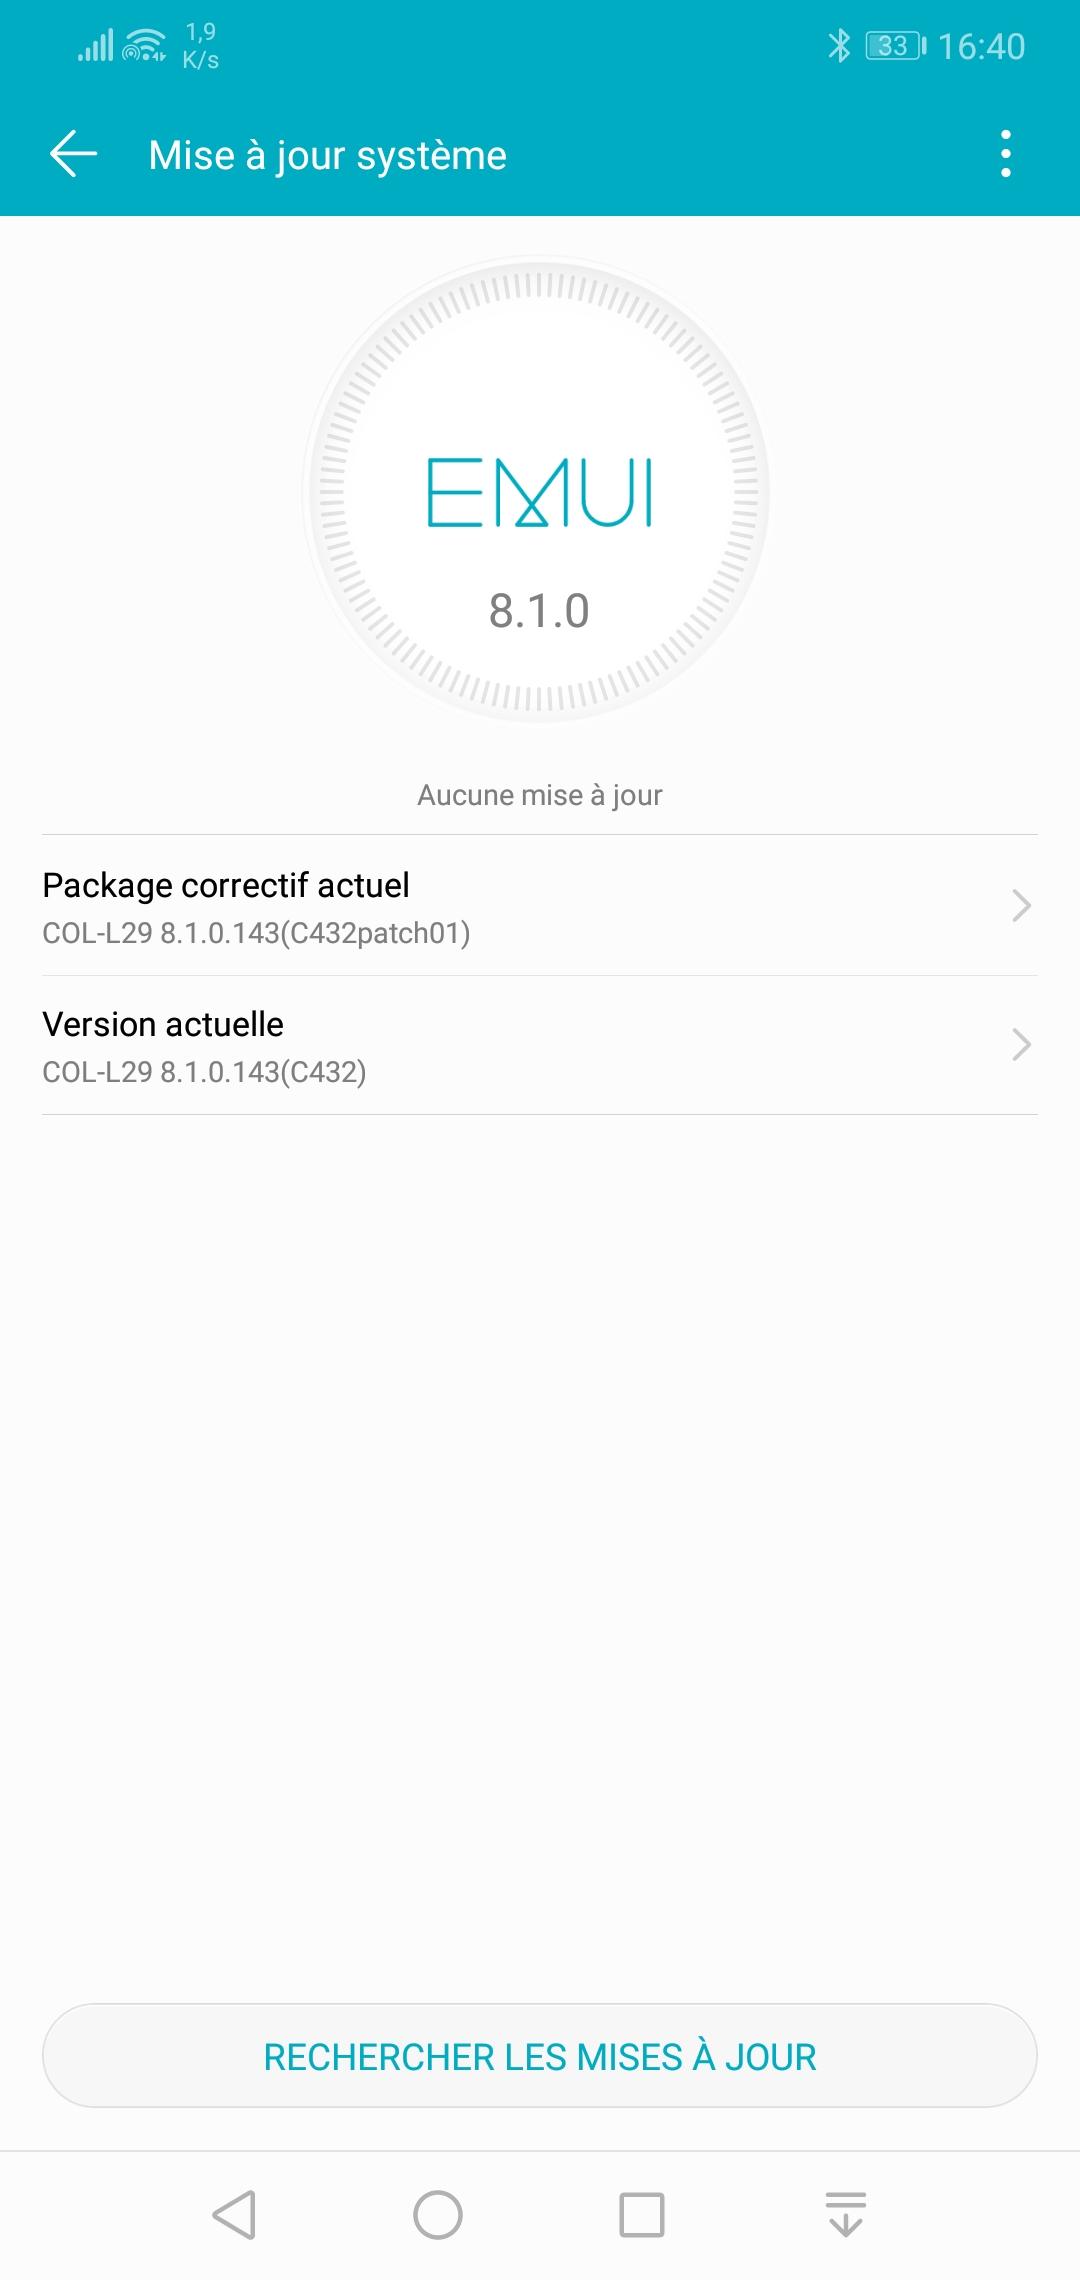 20180906_COL-L29 8.1.143(C432patch01) (3)